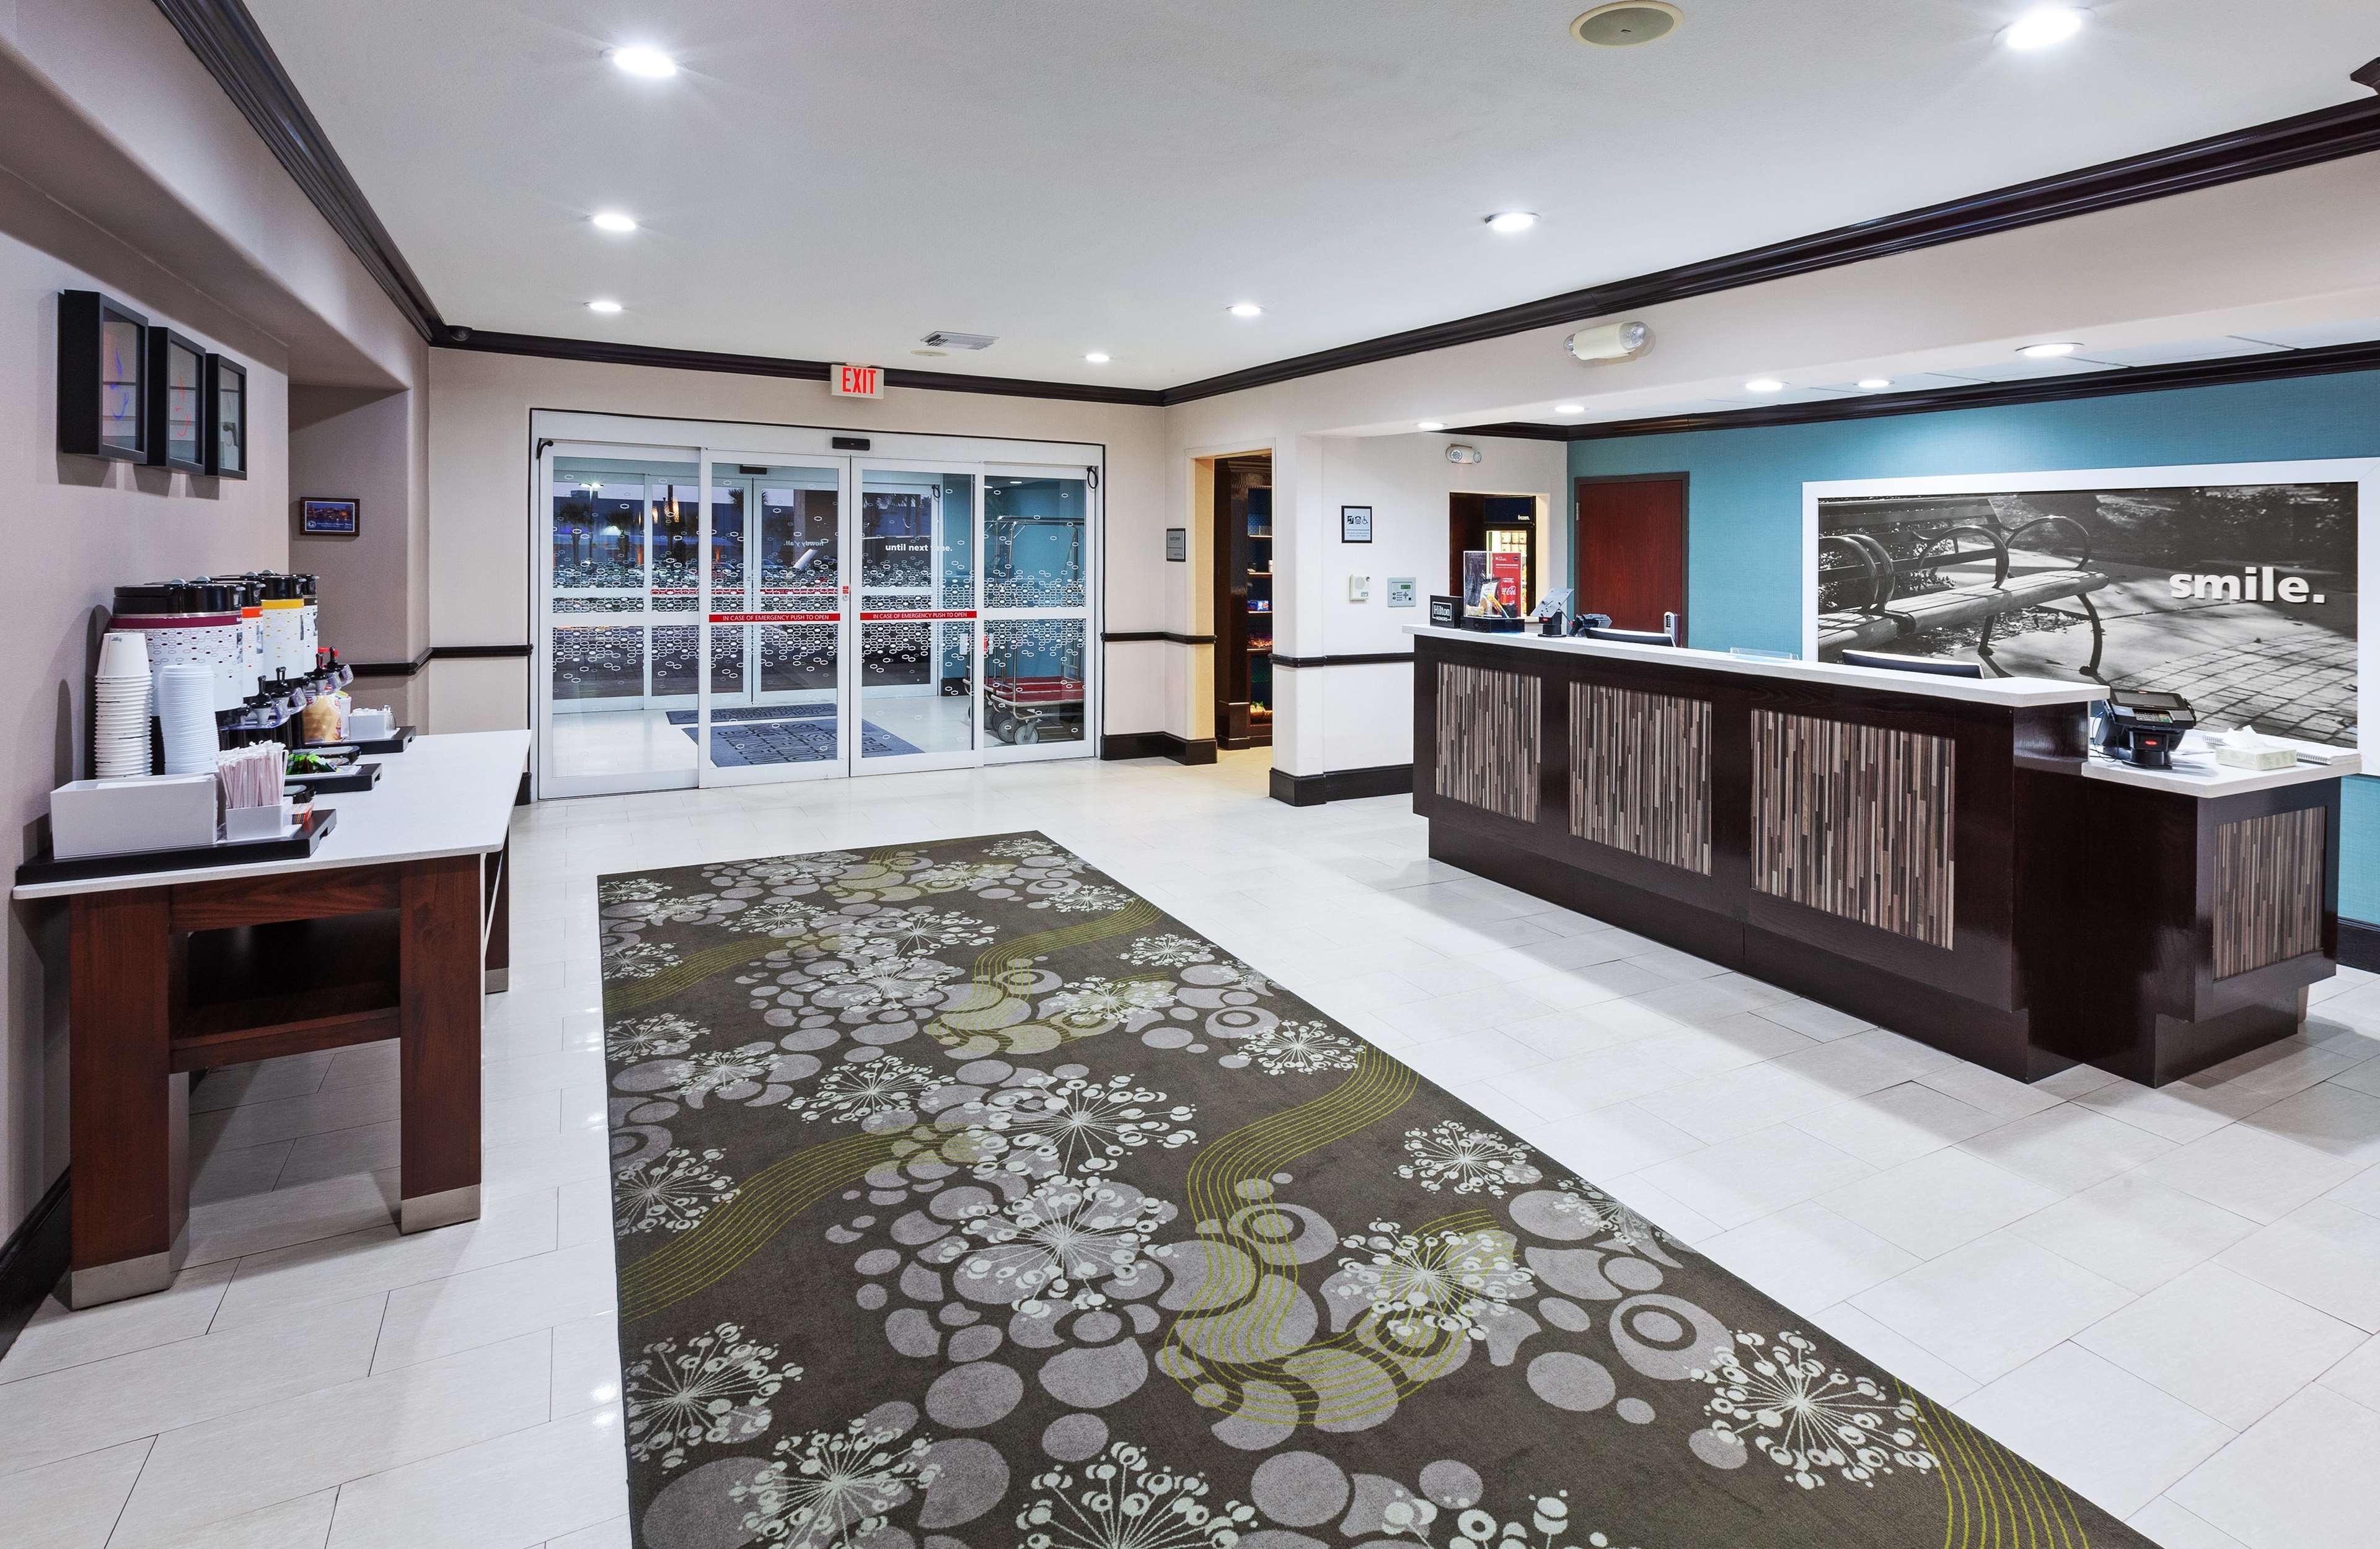 Hampton Inn & Suites Galveston image 8